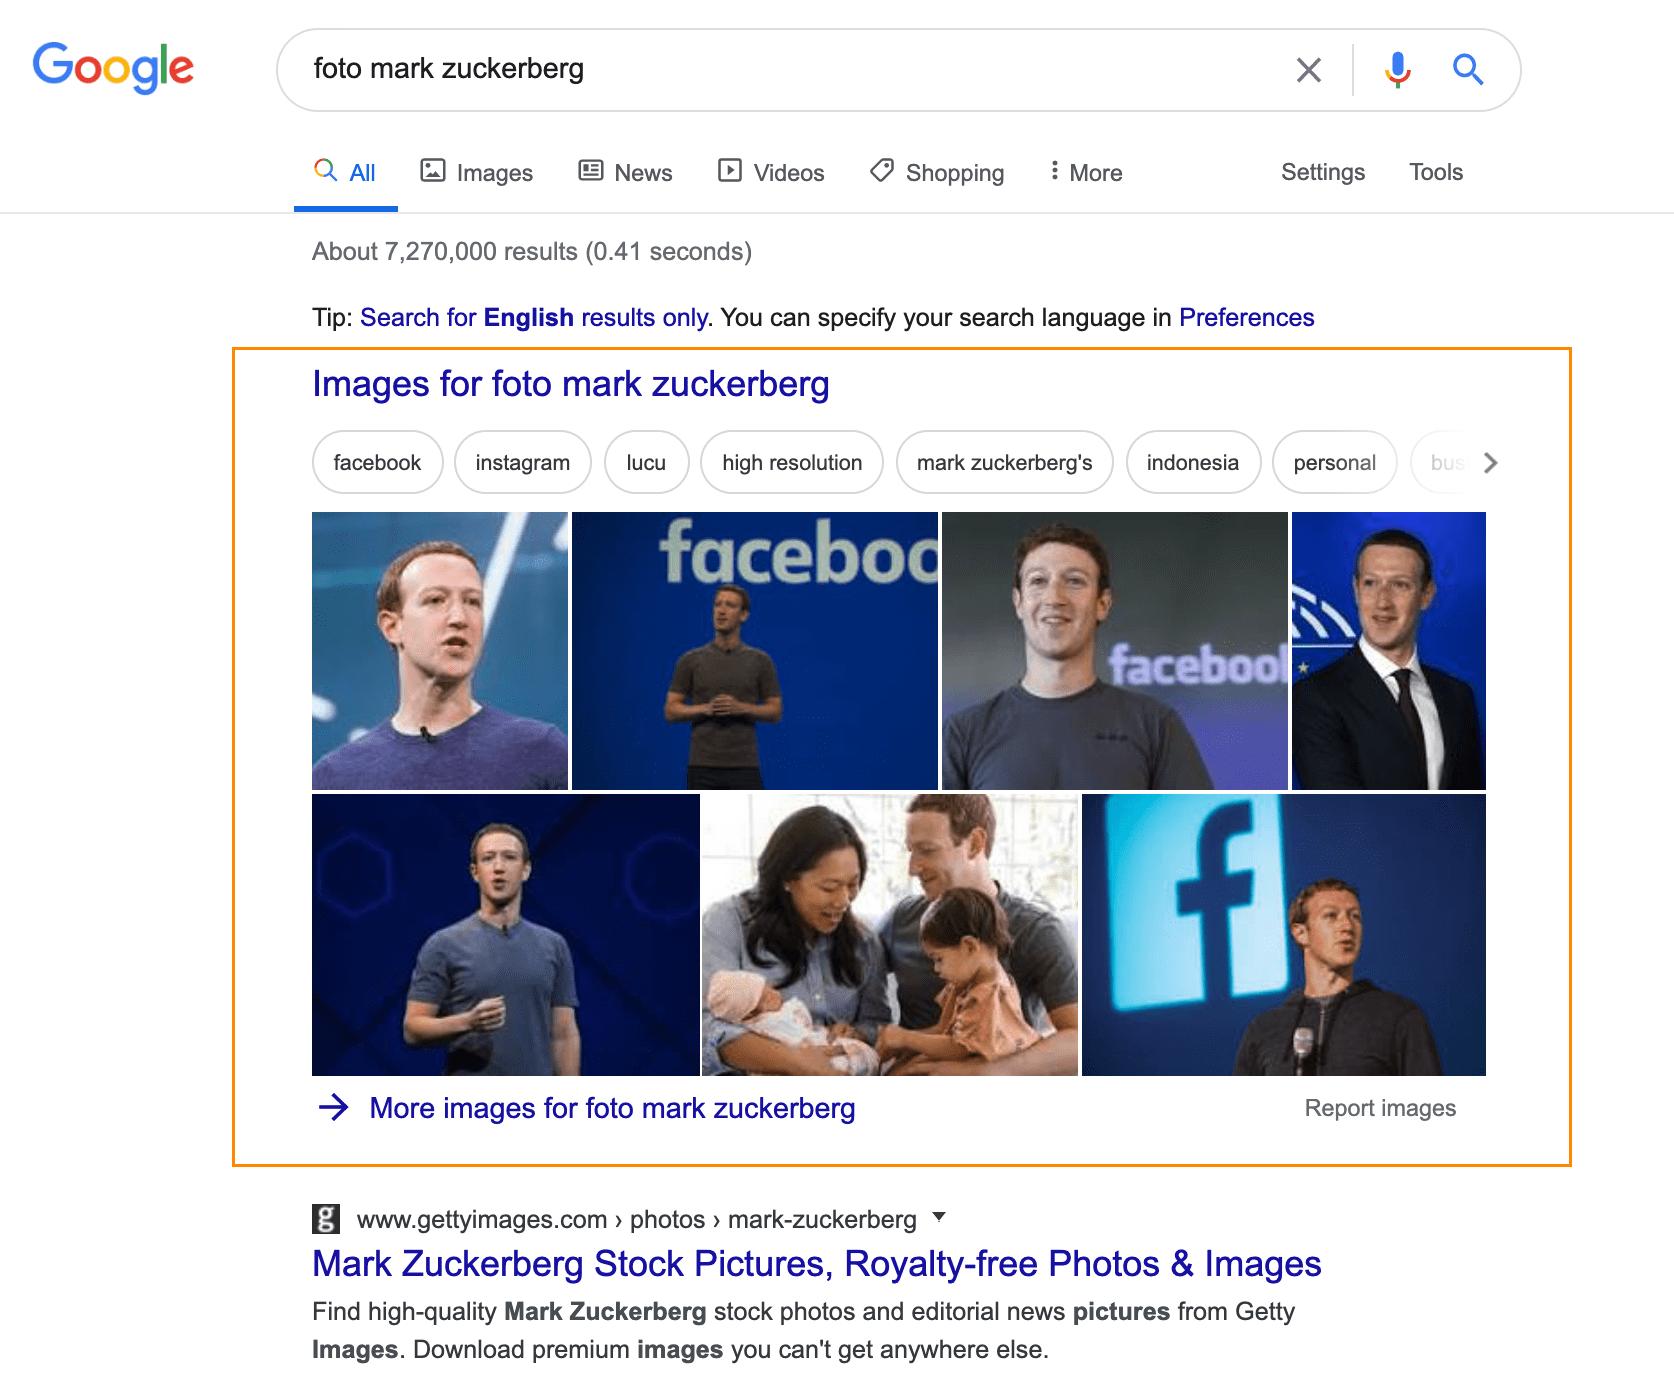 Gambar 2.4 - Google Images